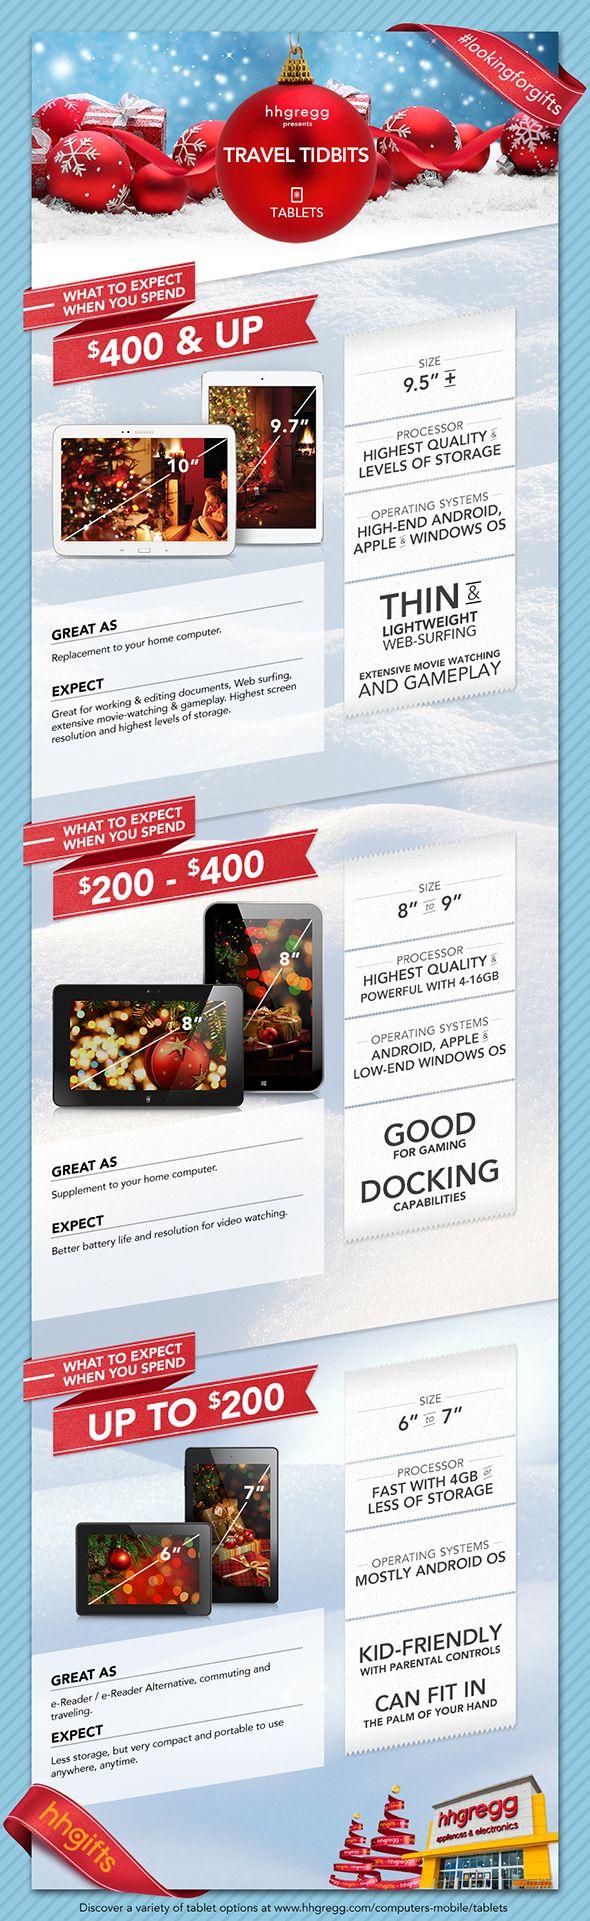 #Tablet Buying Guide - Do you fancy an infographic? There are a lot of them online, but if you want your own please visit http://www.linfografico.com/prezzi/ Online girano molte infografiche, se ne vuoi realizzare una tutta tua visita http://www.linfografico.com/prezzi/